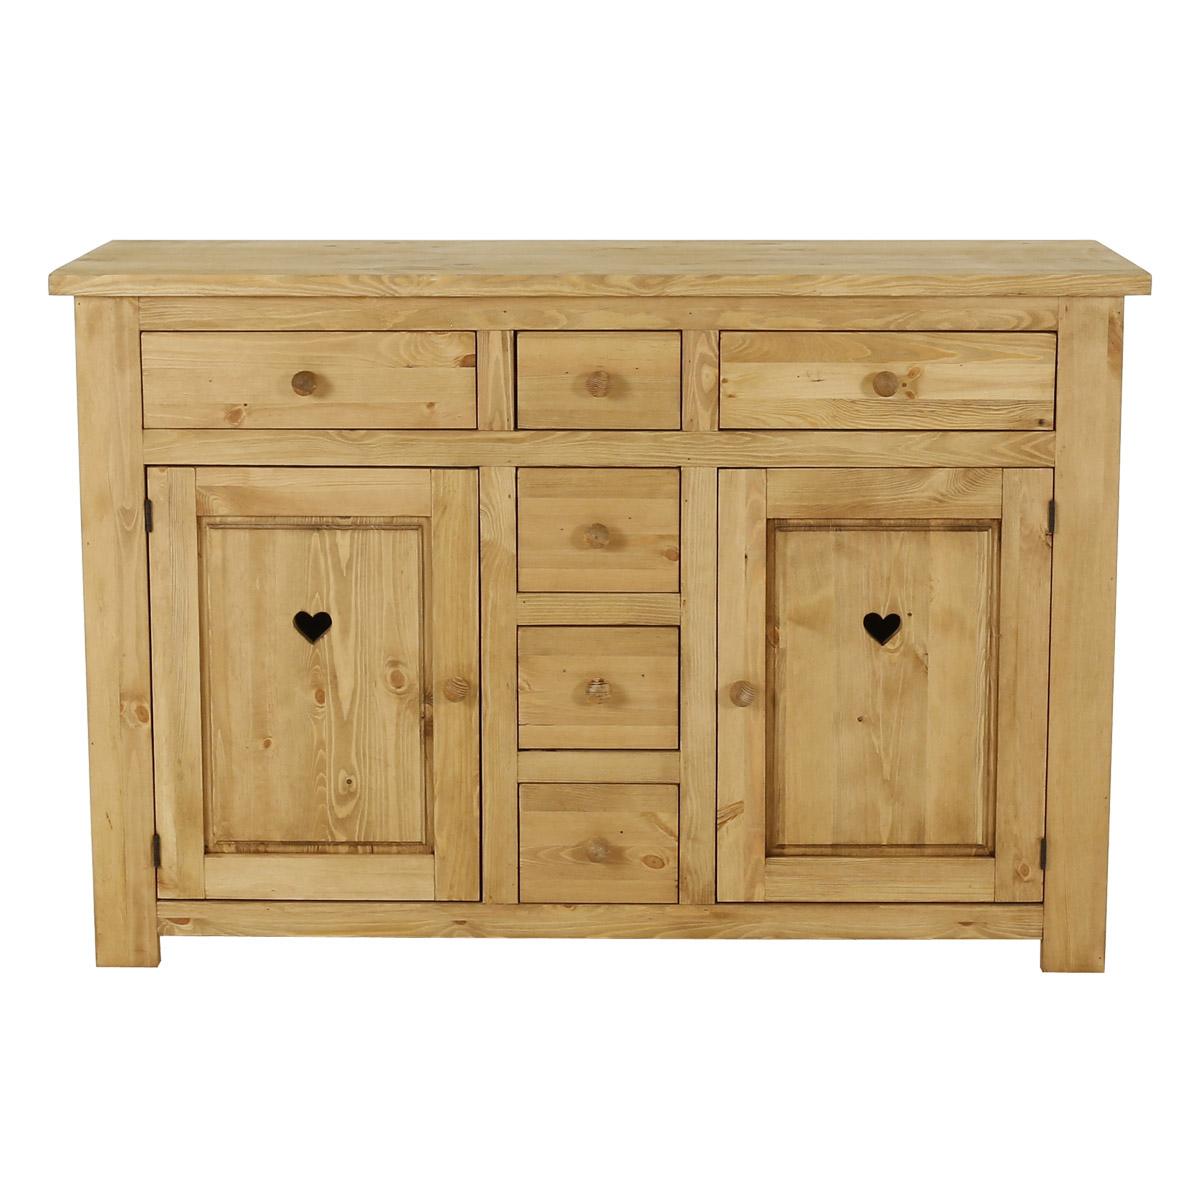 Bahut rustique pin massif 2 portes + 6 tiroirs avec coeur